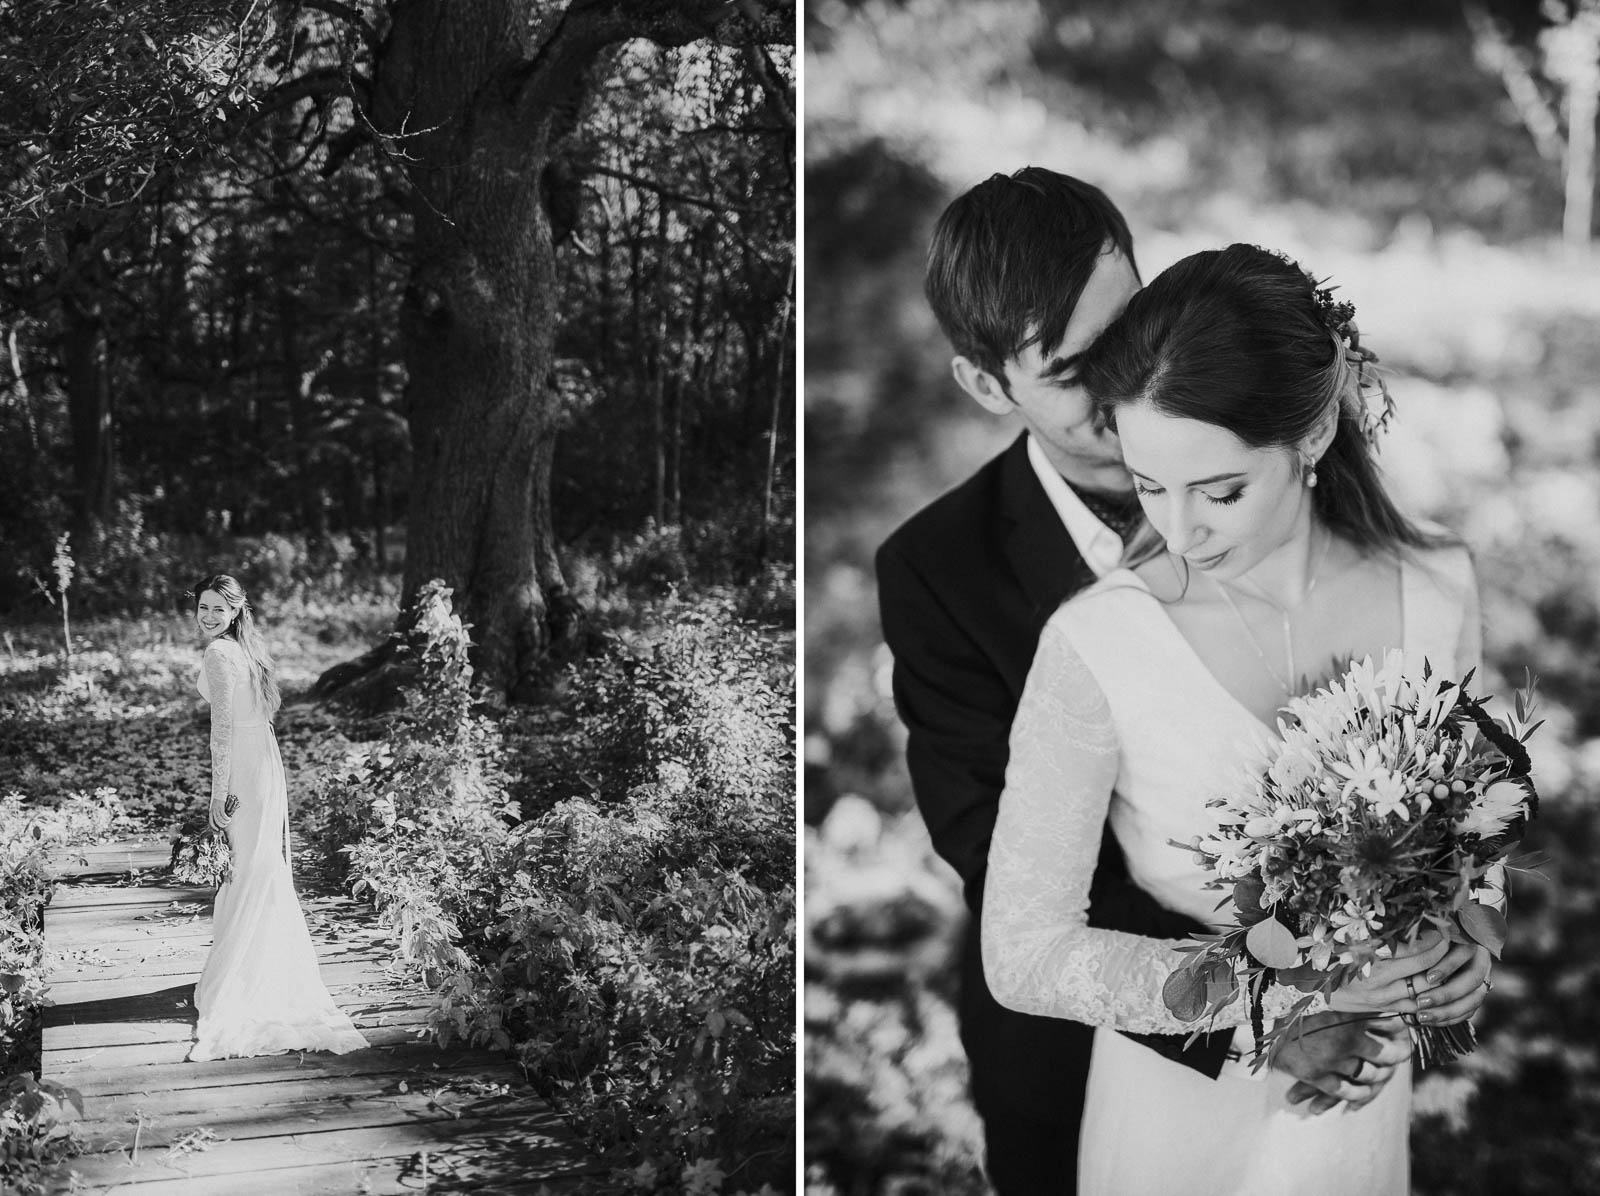 Pohjaka_mois_manor_pulm_wedding_Mait_Juriado-19